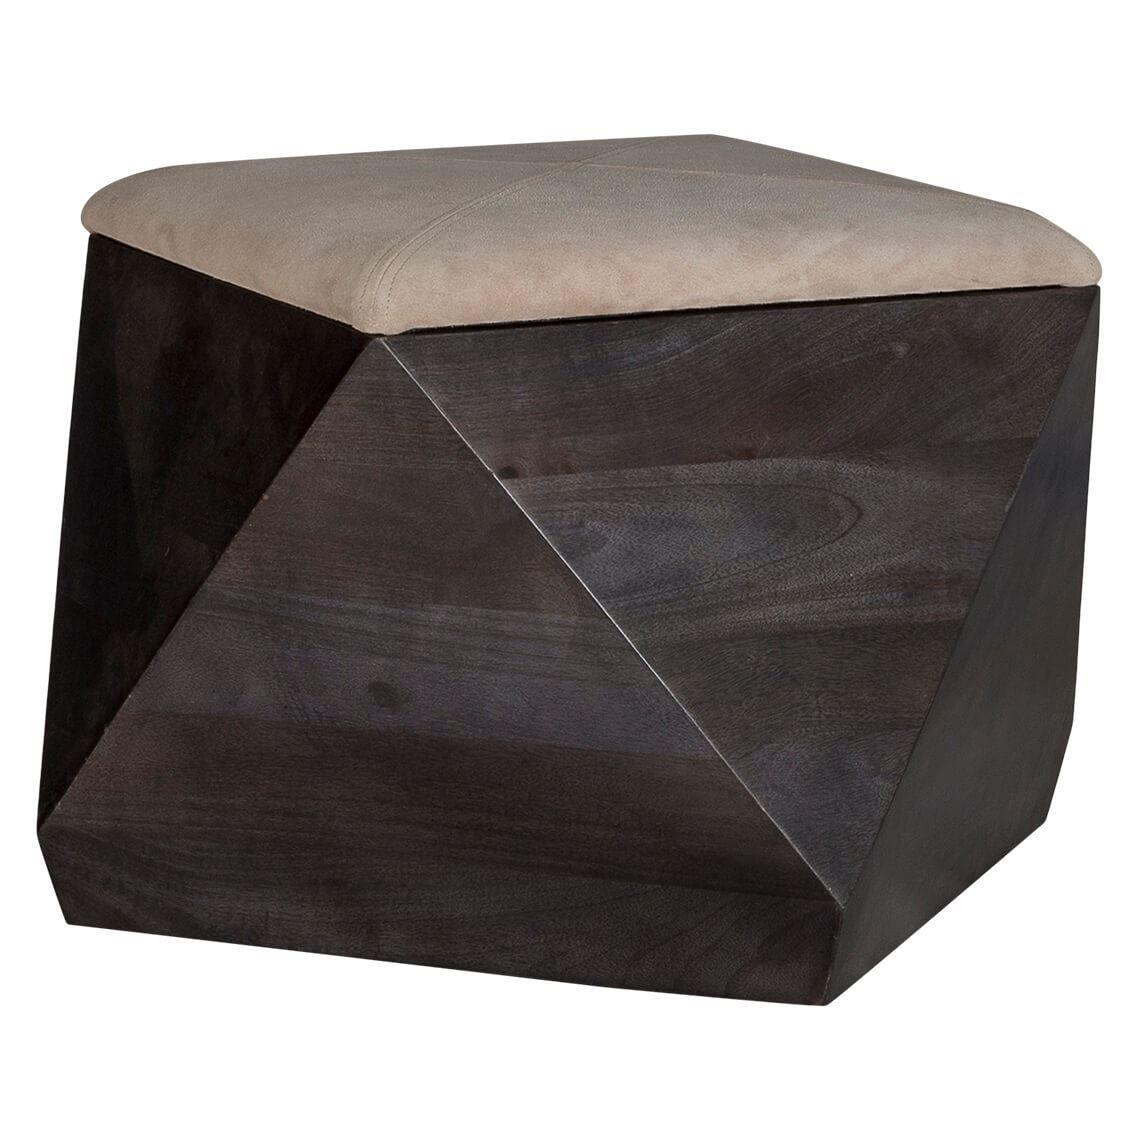 Enjoyable Prism Storage Stool With Leather Black Products In 2019 Inzonedesignstudio Interior Chair Design Inzonedesignstudiocom